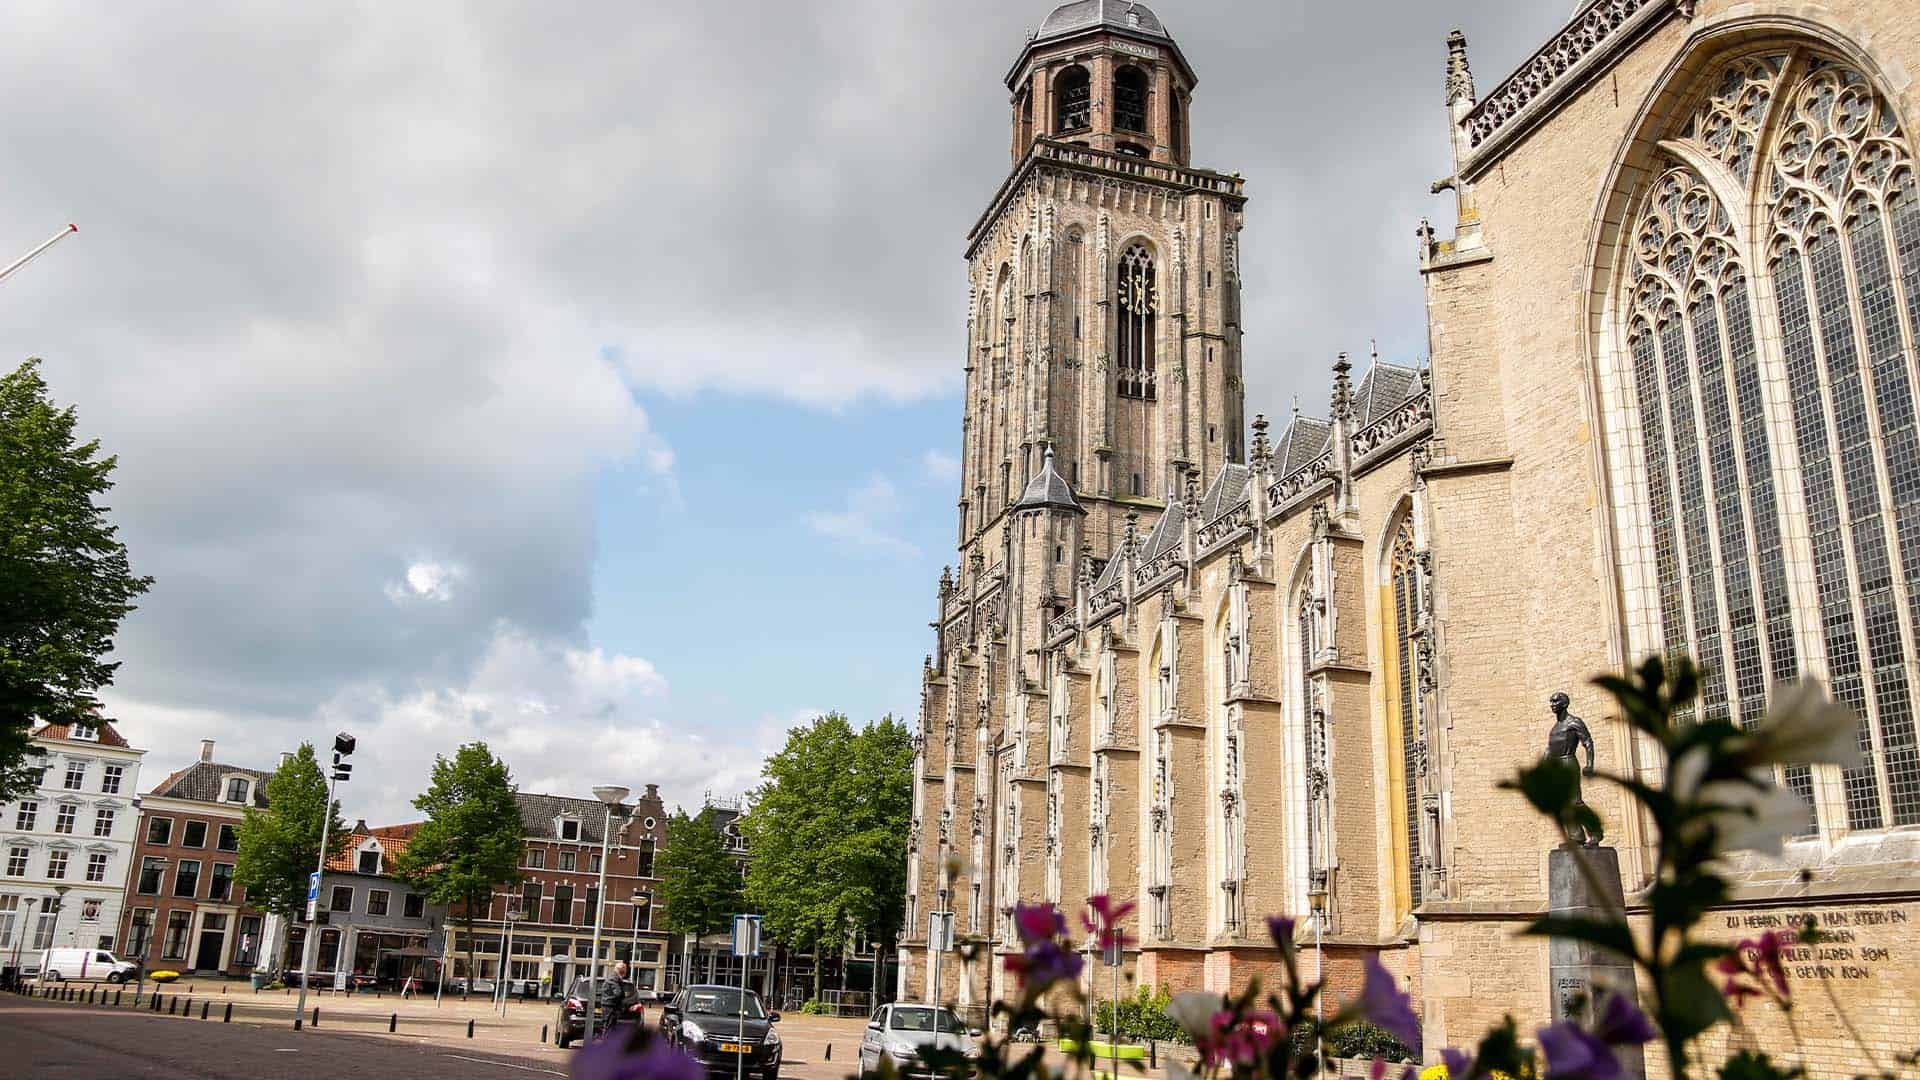 Lebuinuskerk-1